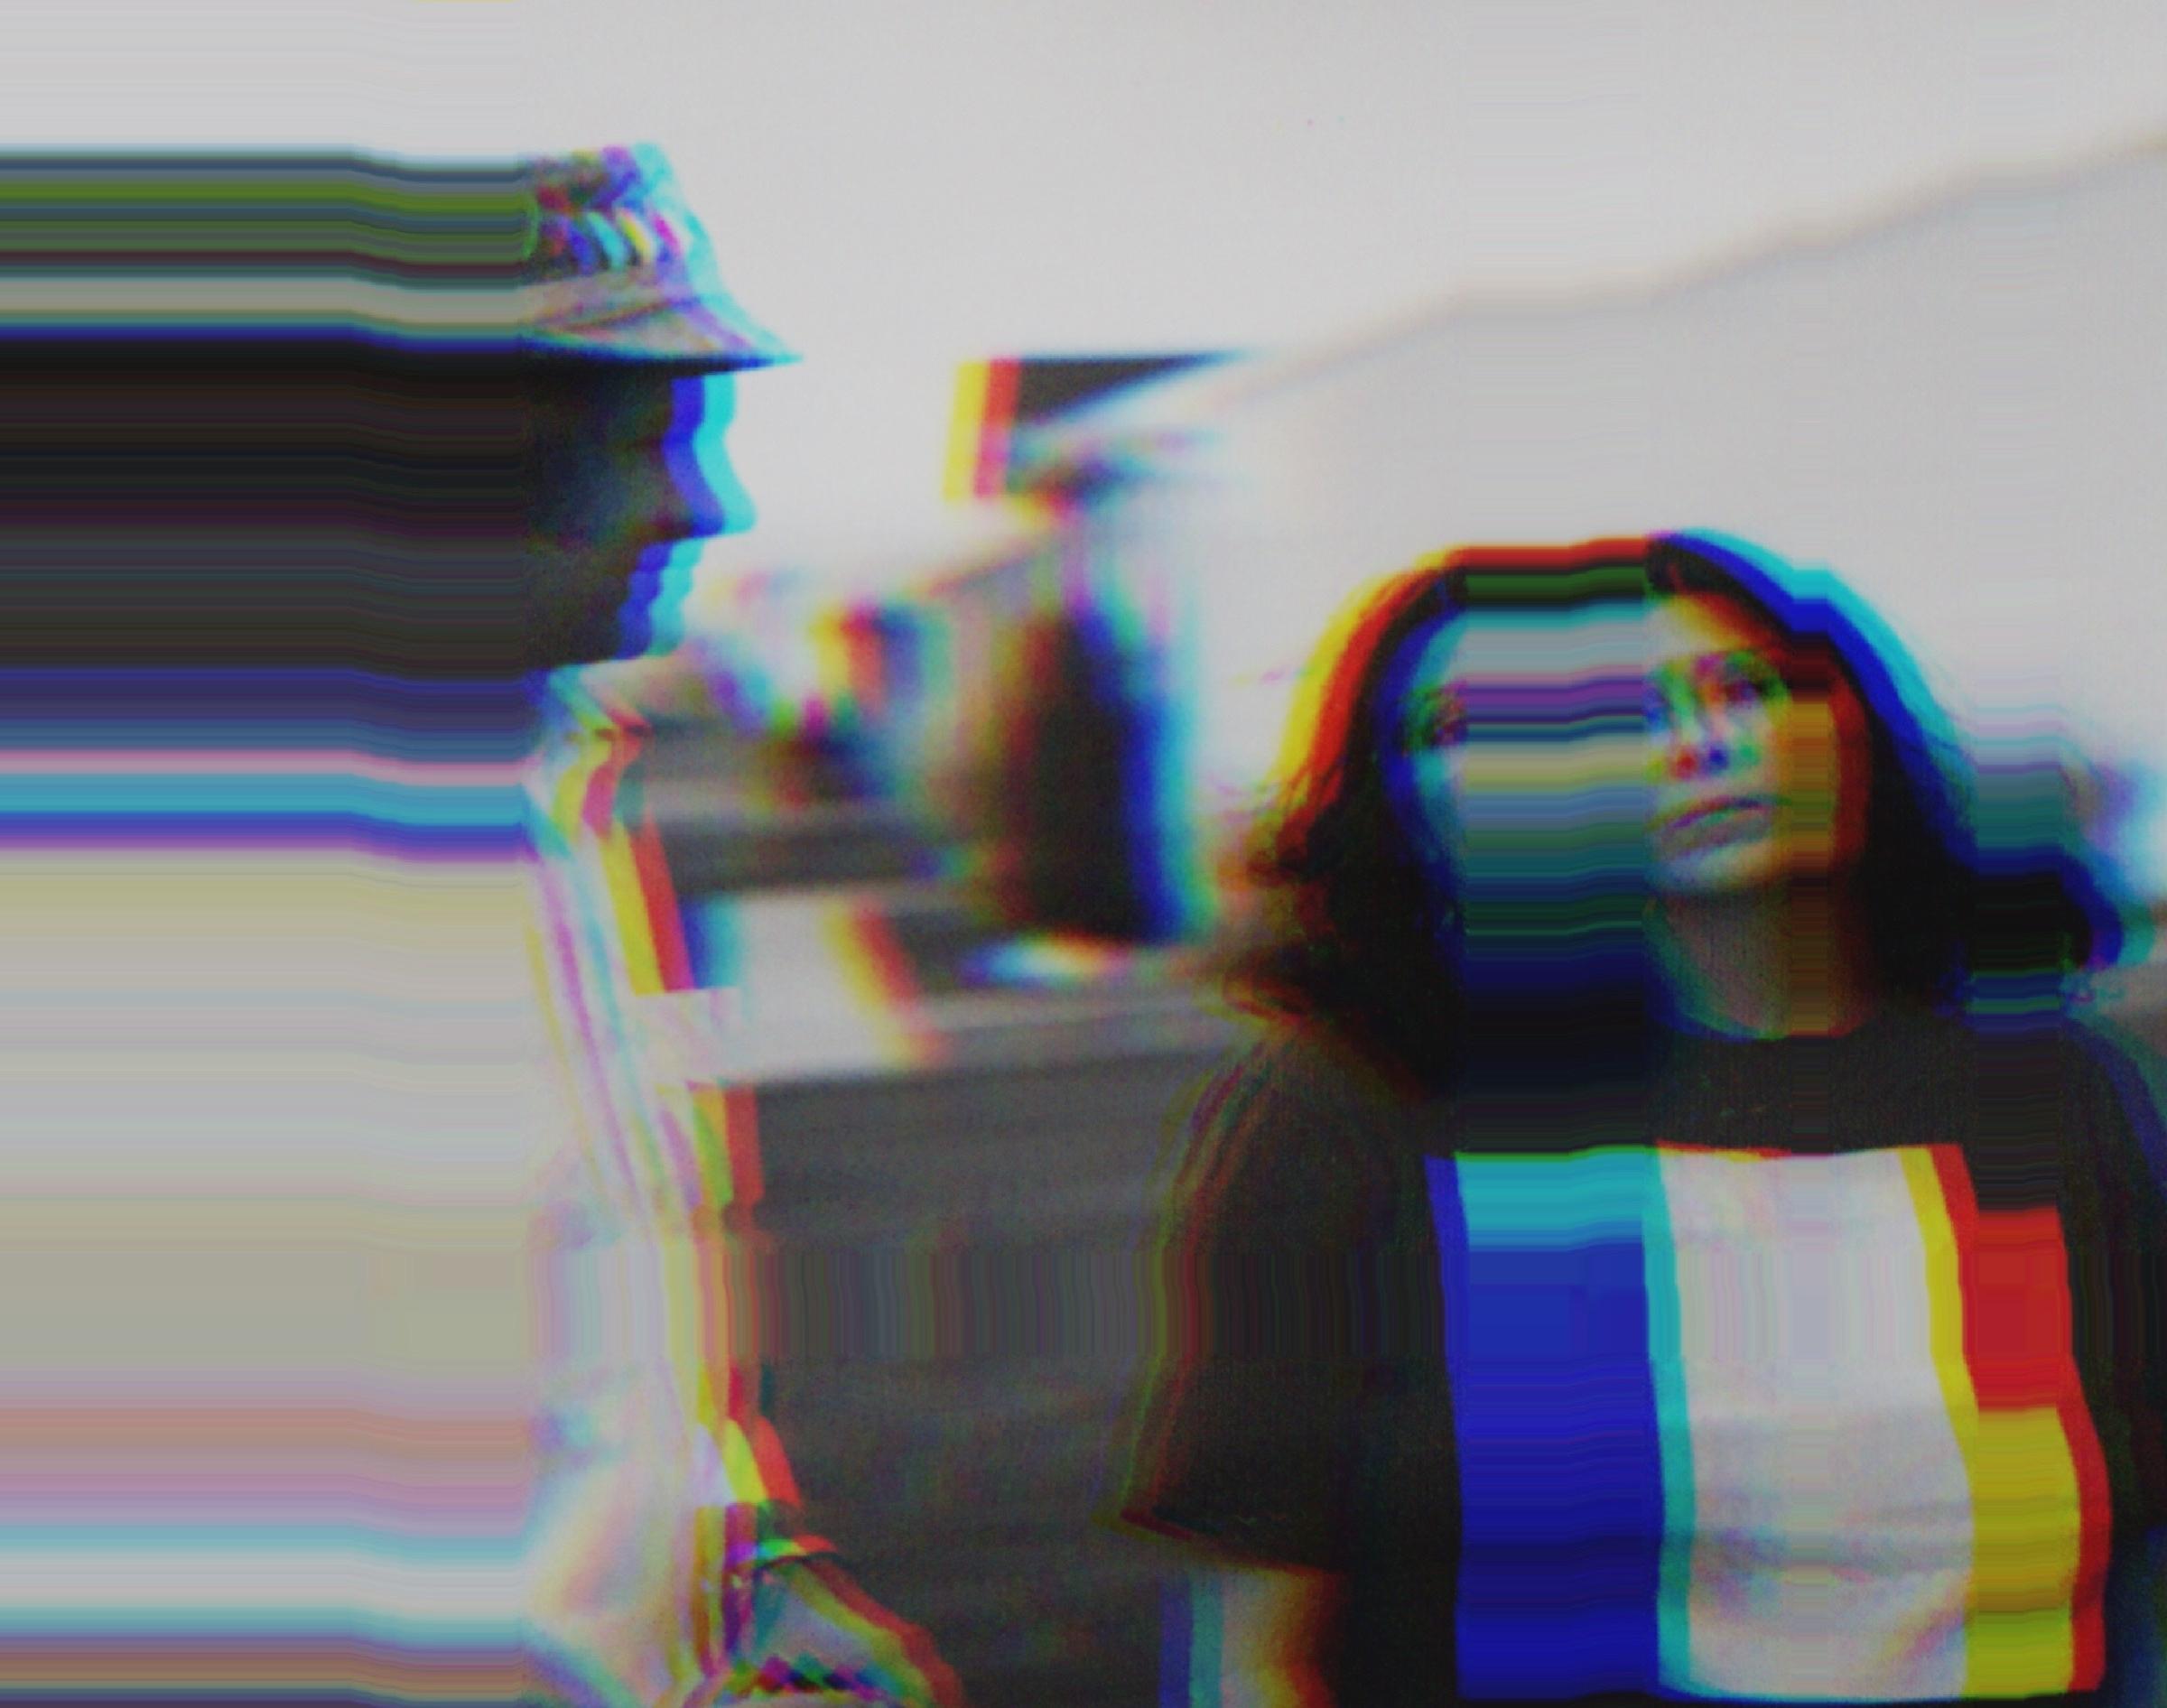 Digital Detritus No. 4    Digitally manipulated image  dimensions variable  2016